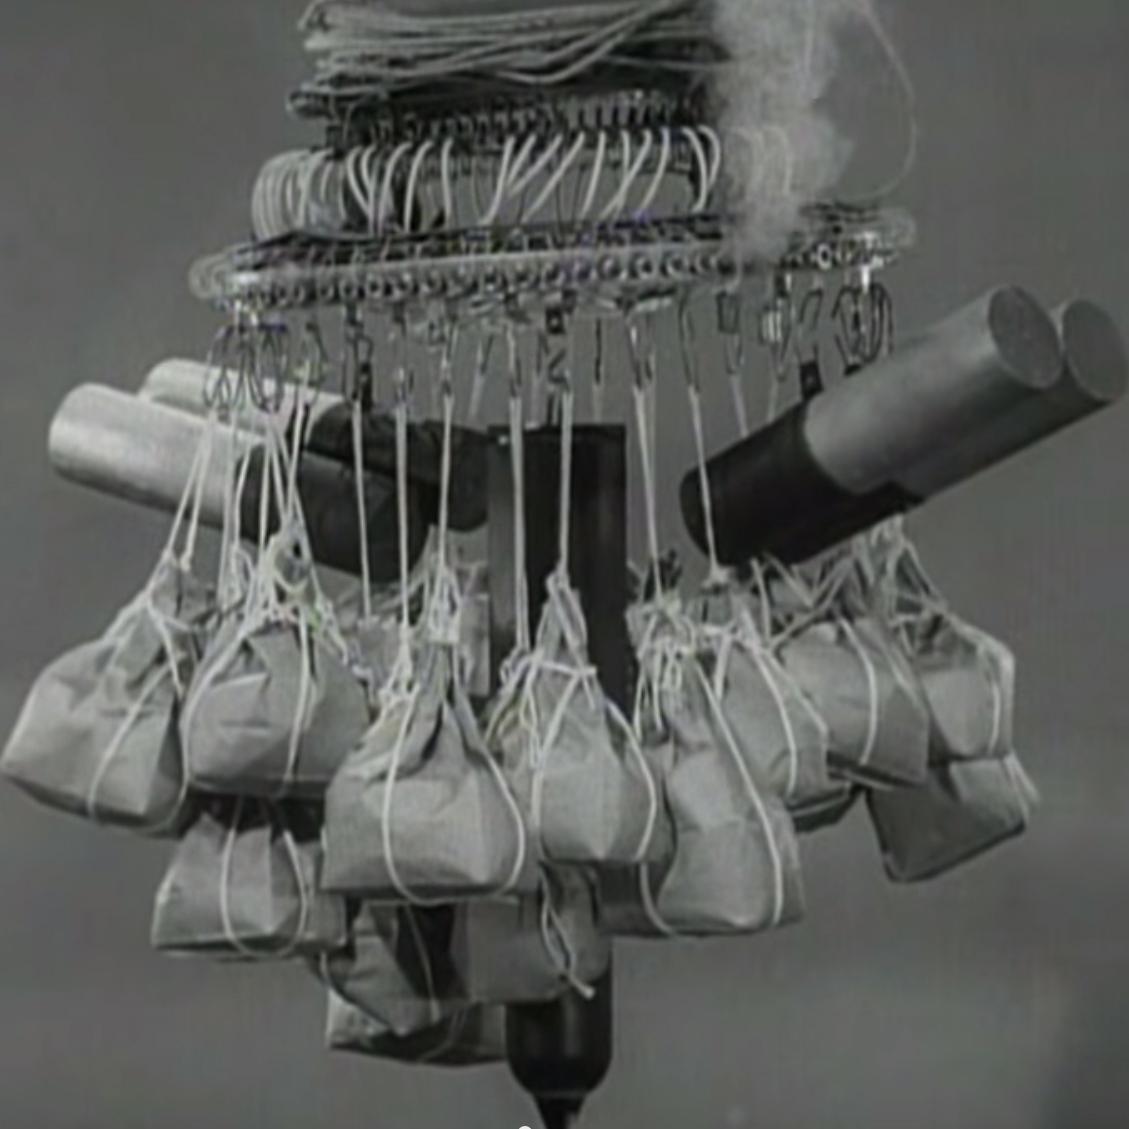 Amazon.com: Japan's World War II Balloon Bomb Attacks on North ... | 1129x1129